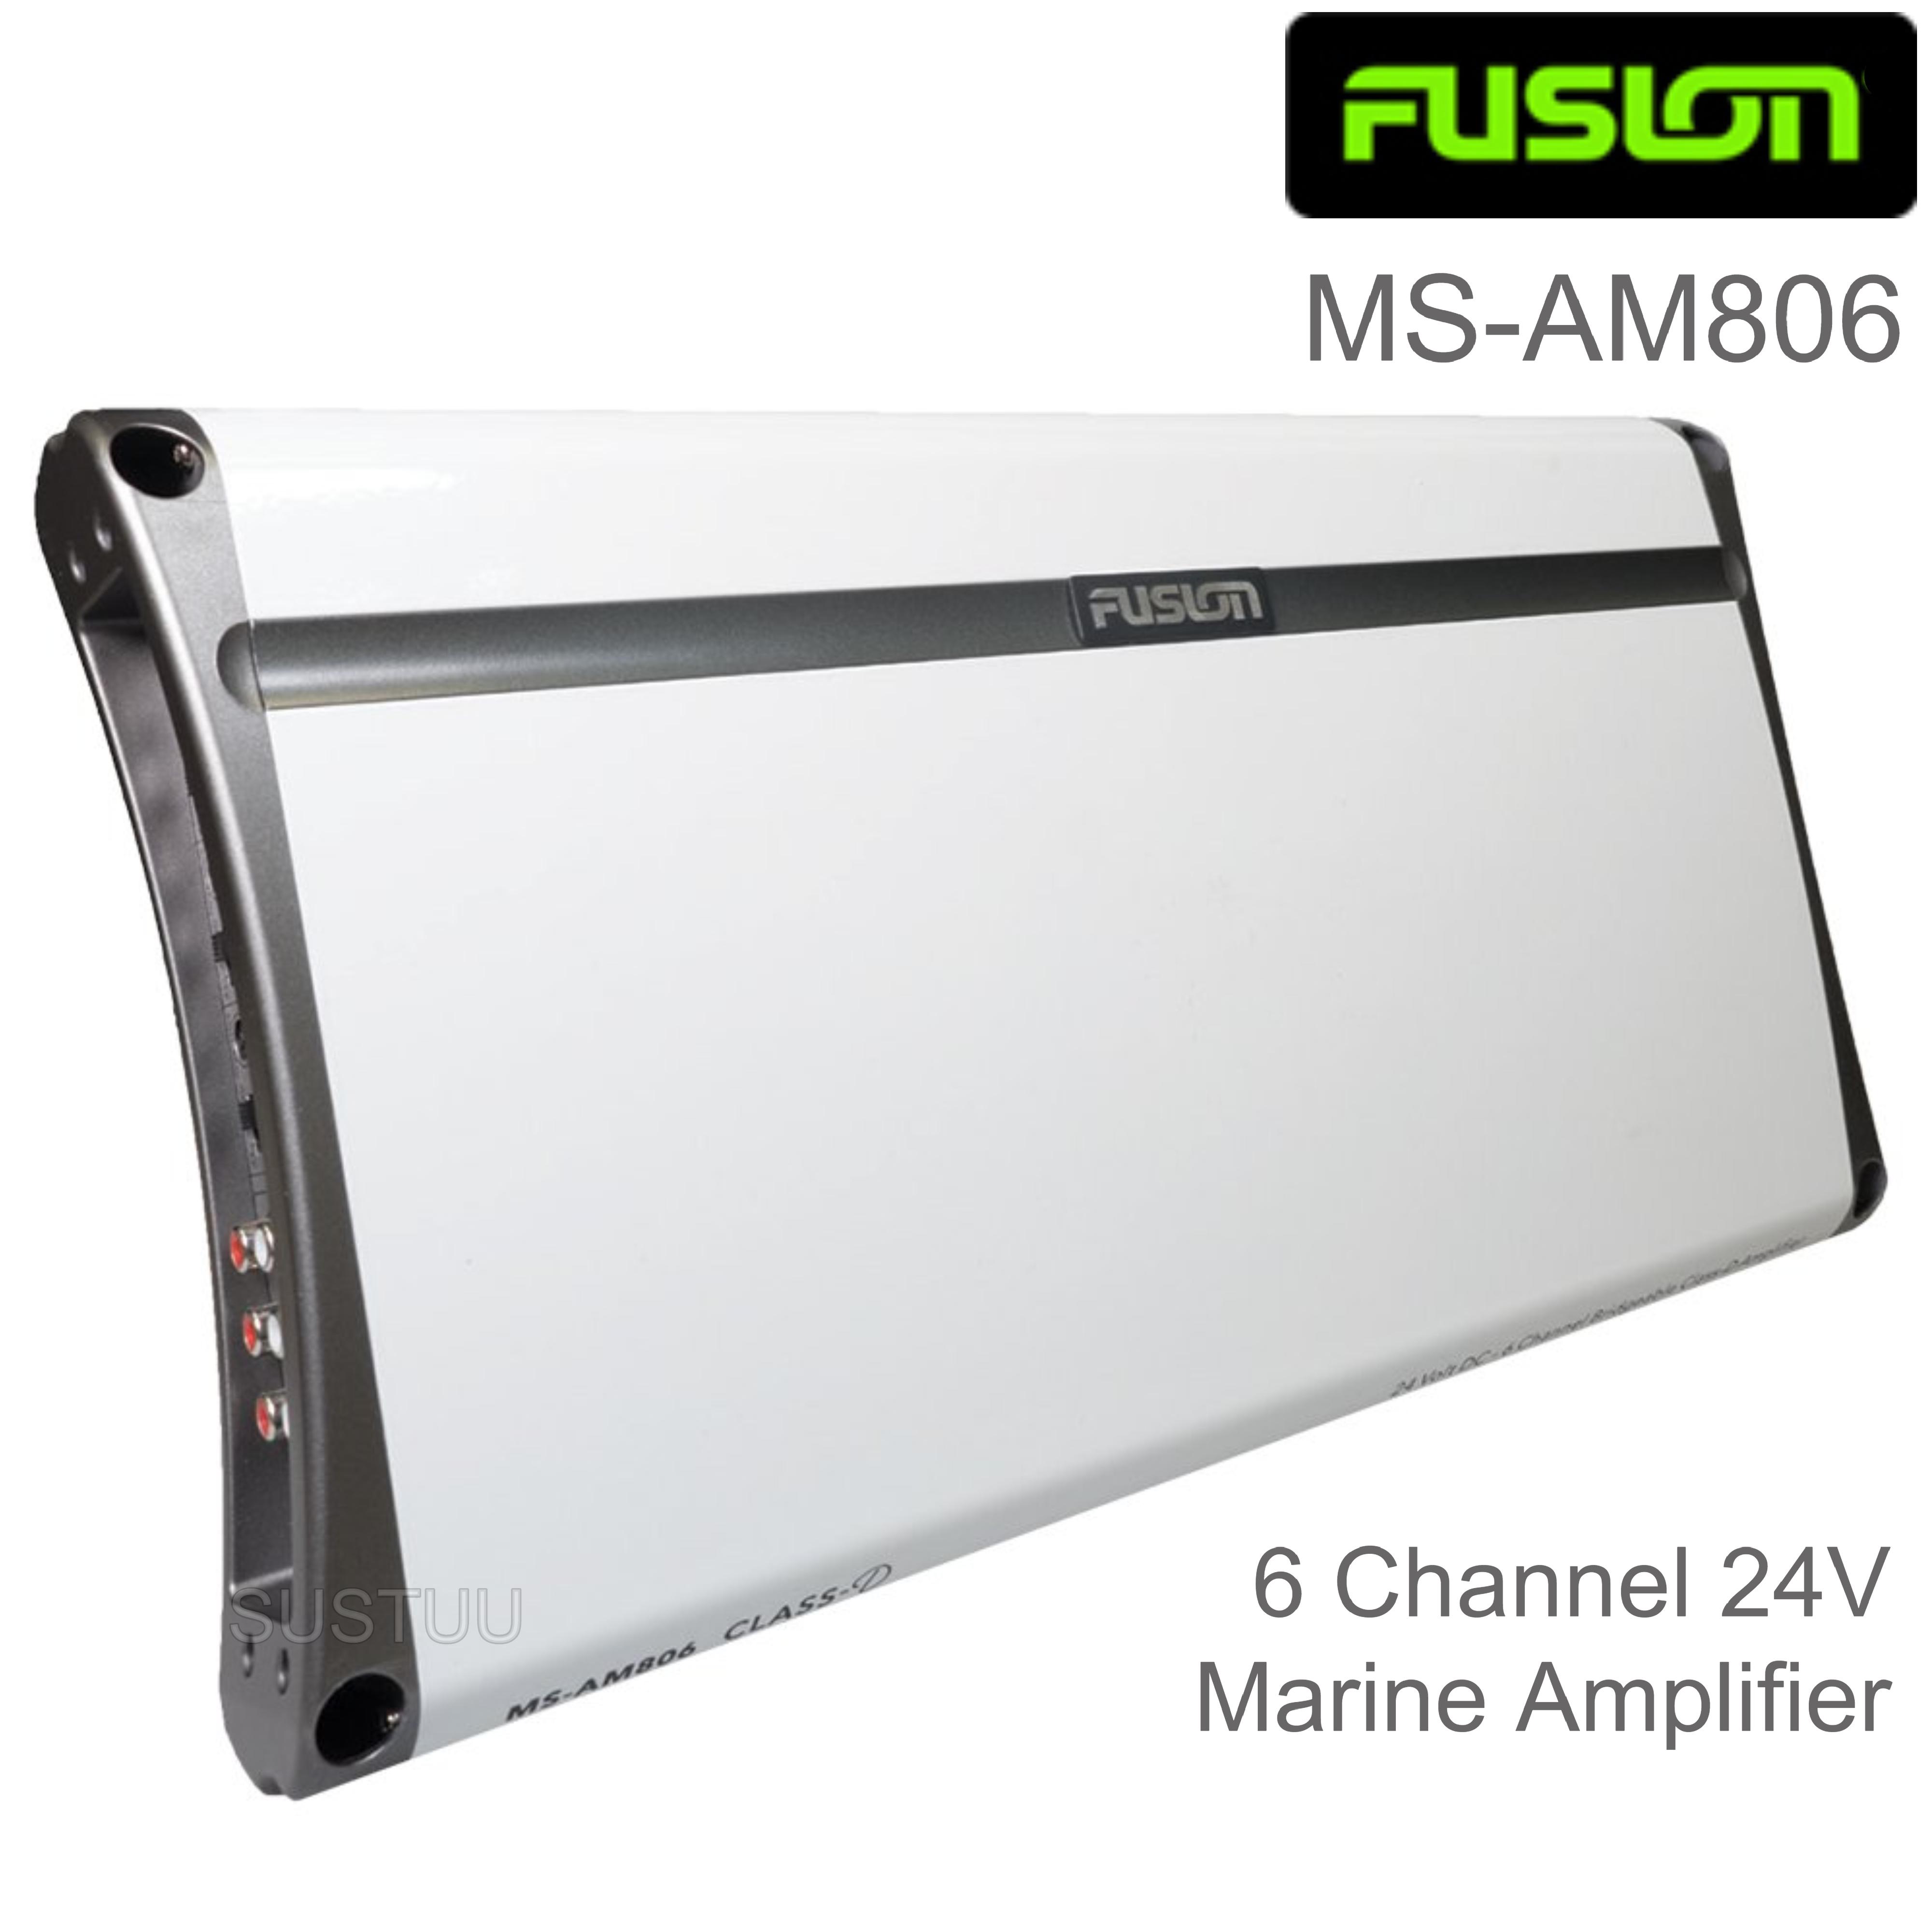 Fusion MS-AM806 6 Channel 24V Marine Amplifier | Class-D | 1600W Peak Power | RCA